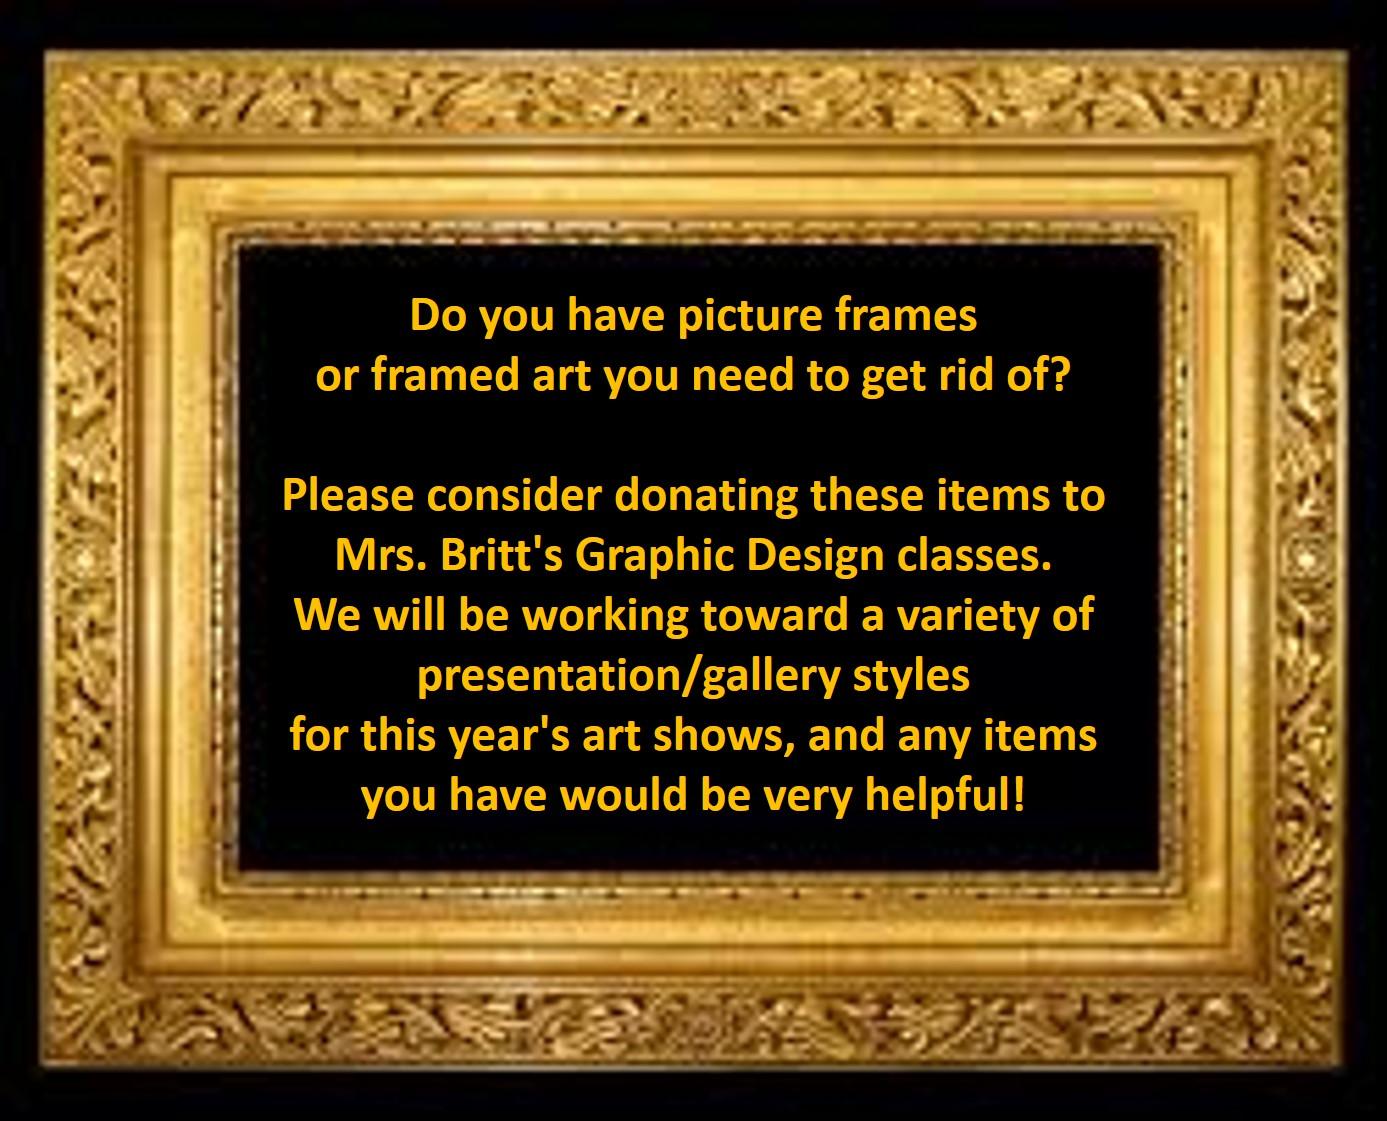 hs-graphic-design-donation-ad.jpg